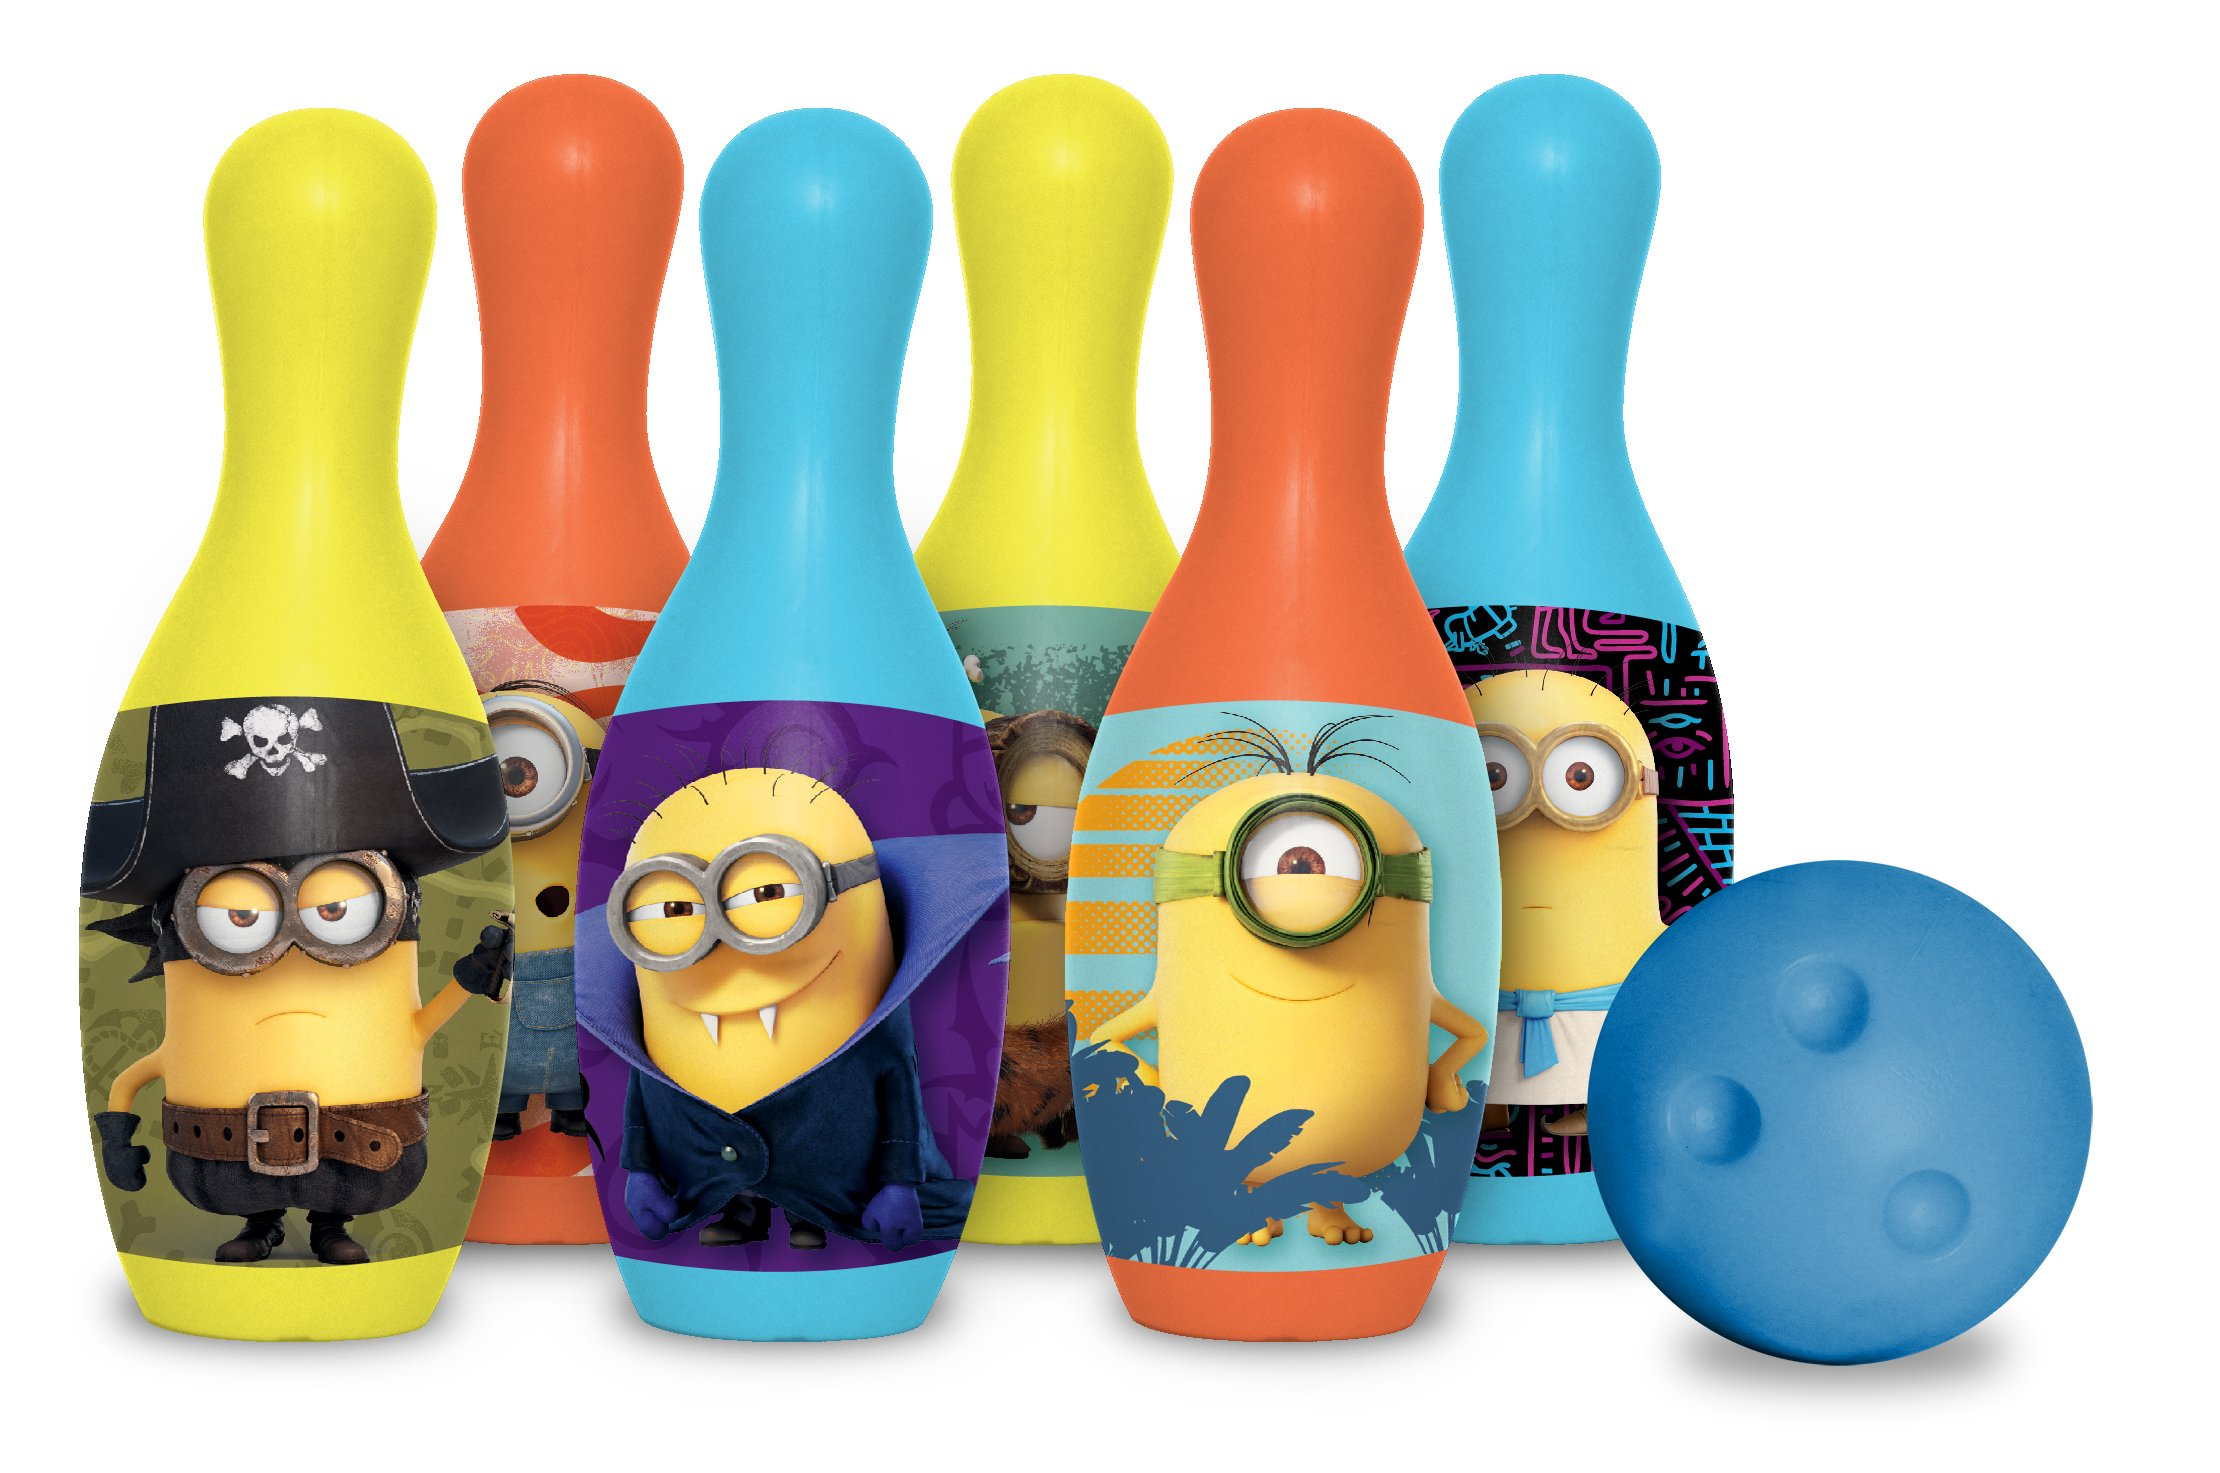 Minions Bowling Set